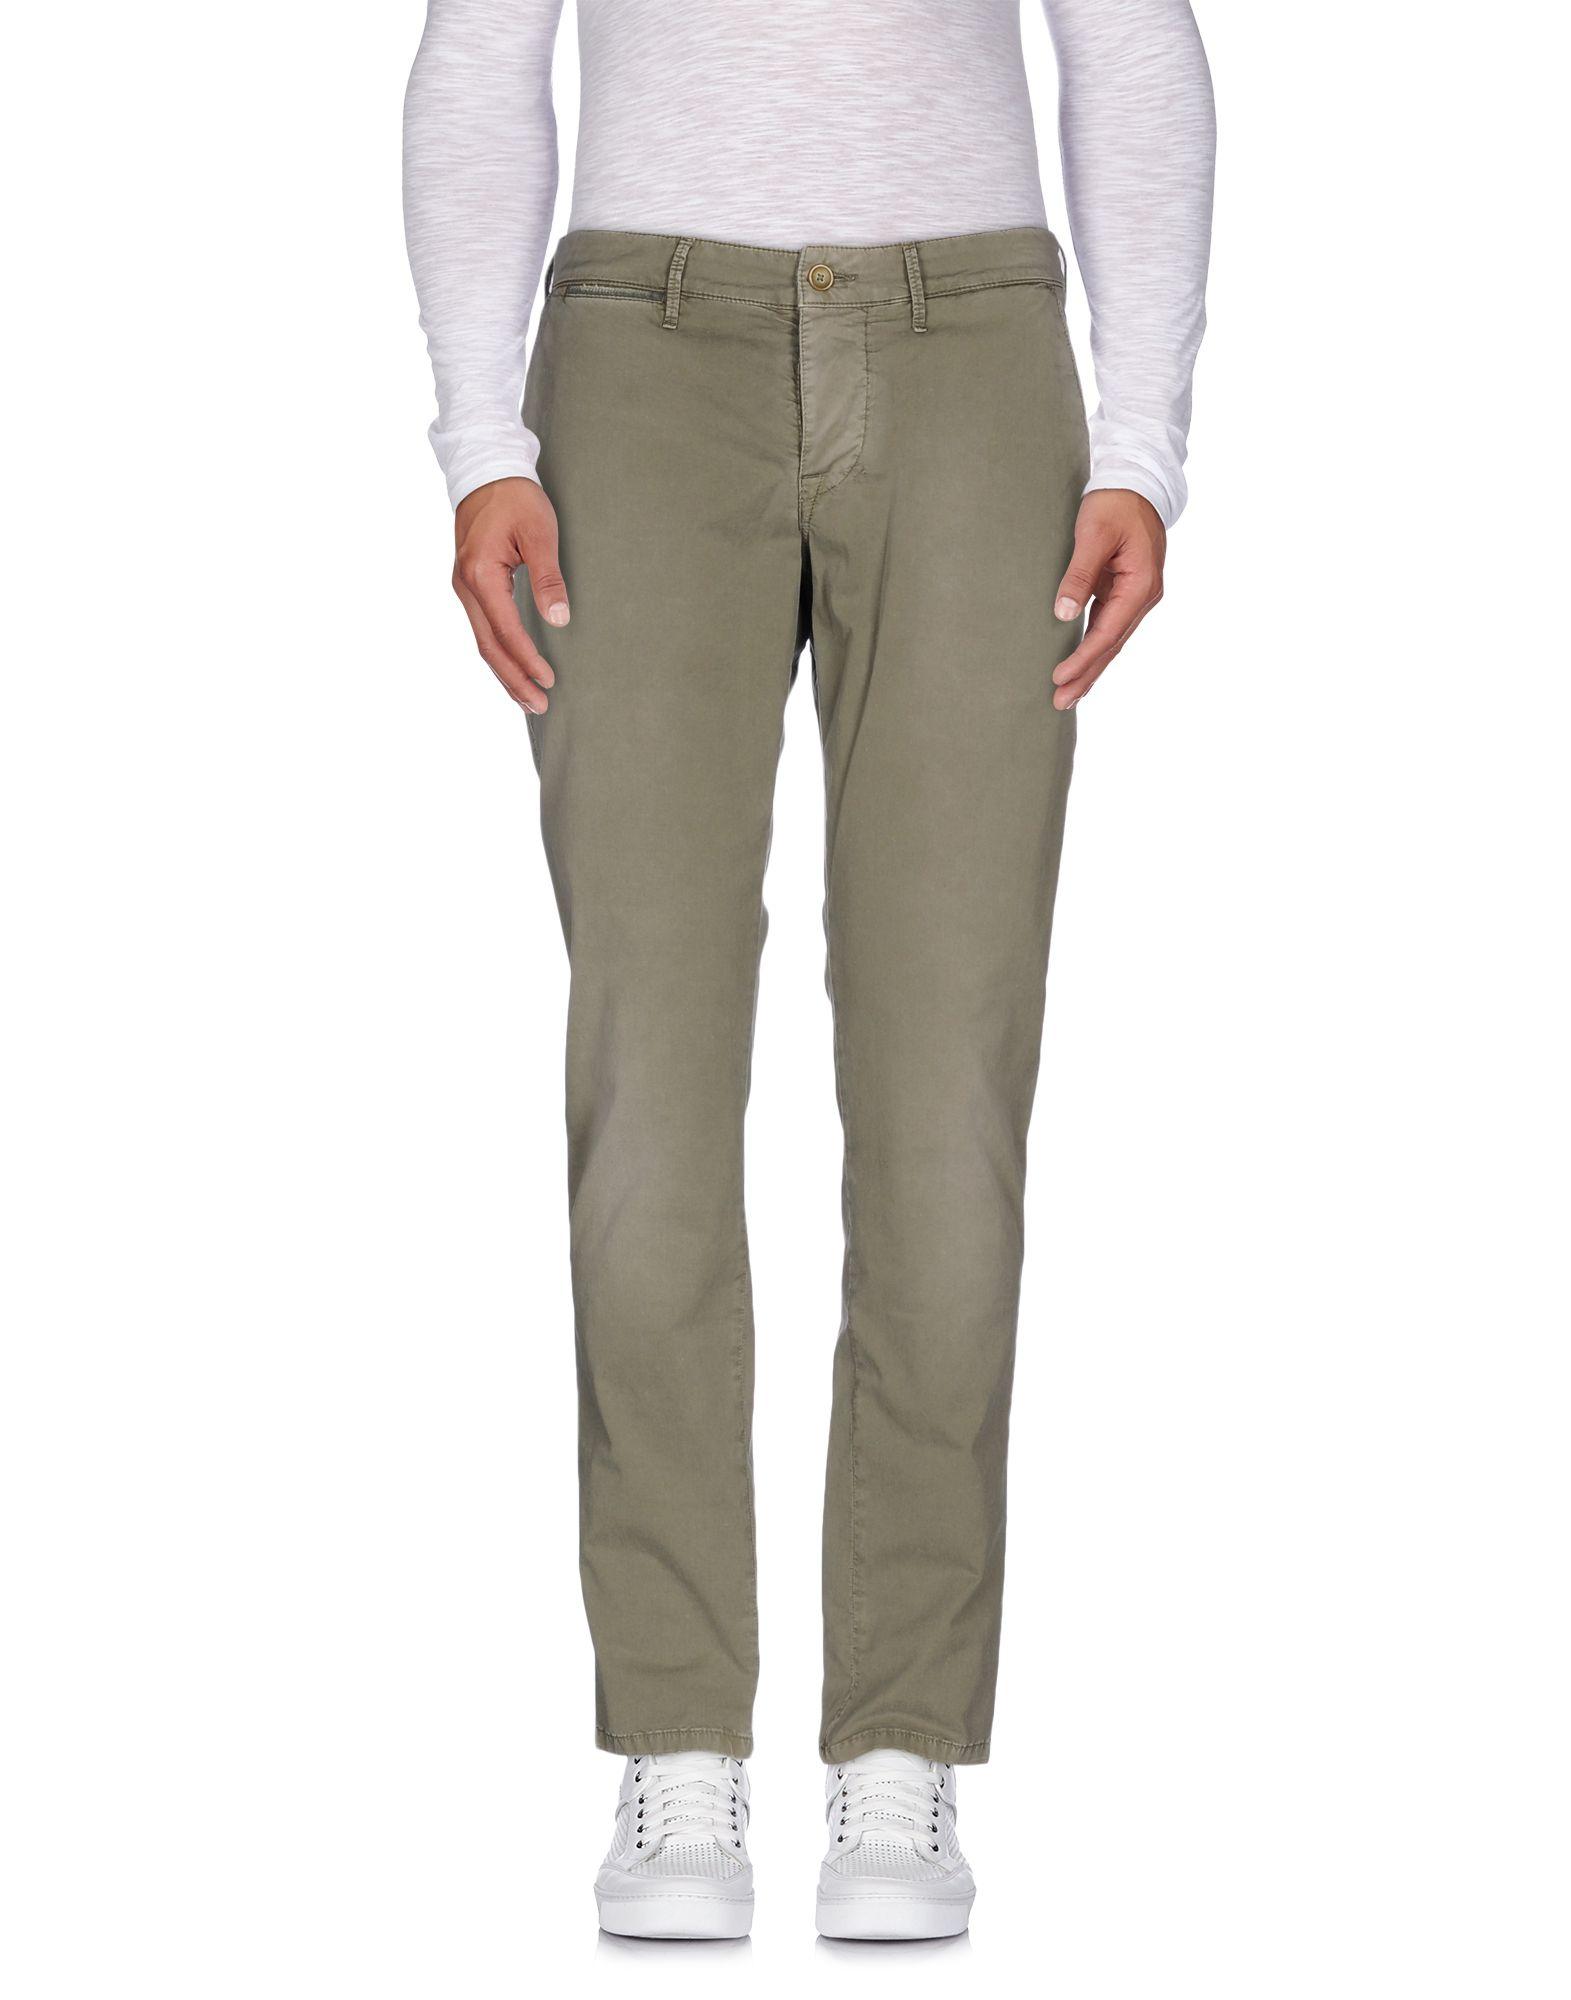 Pantalone Oaks Oaks uomo - 36759823EM  bis zu 42% Rabatt